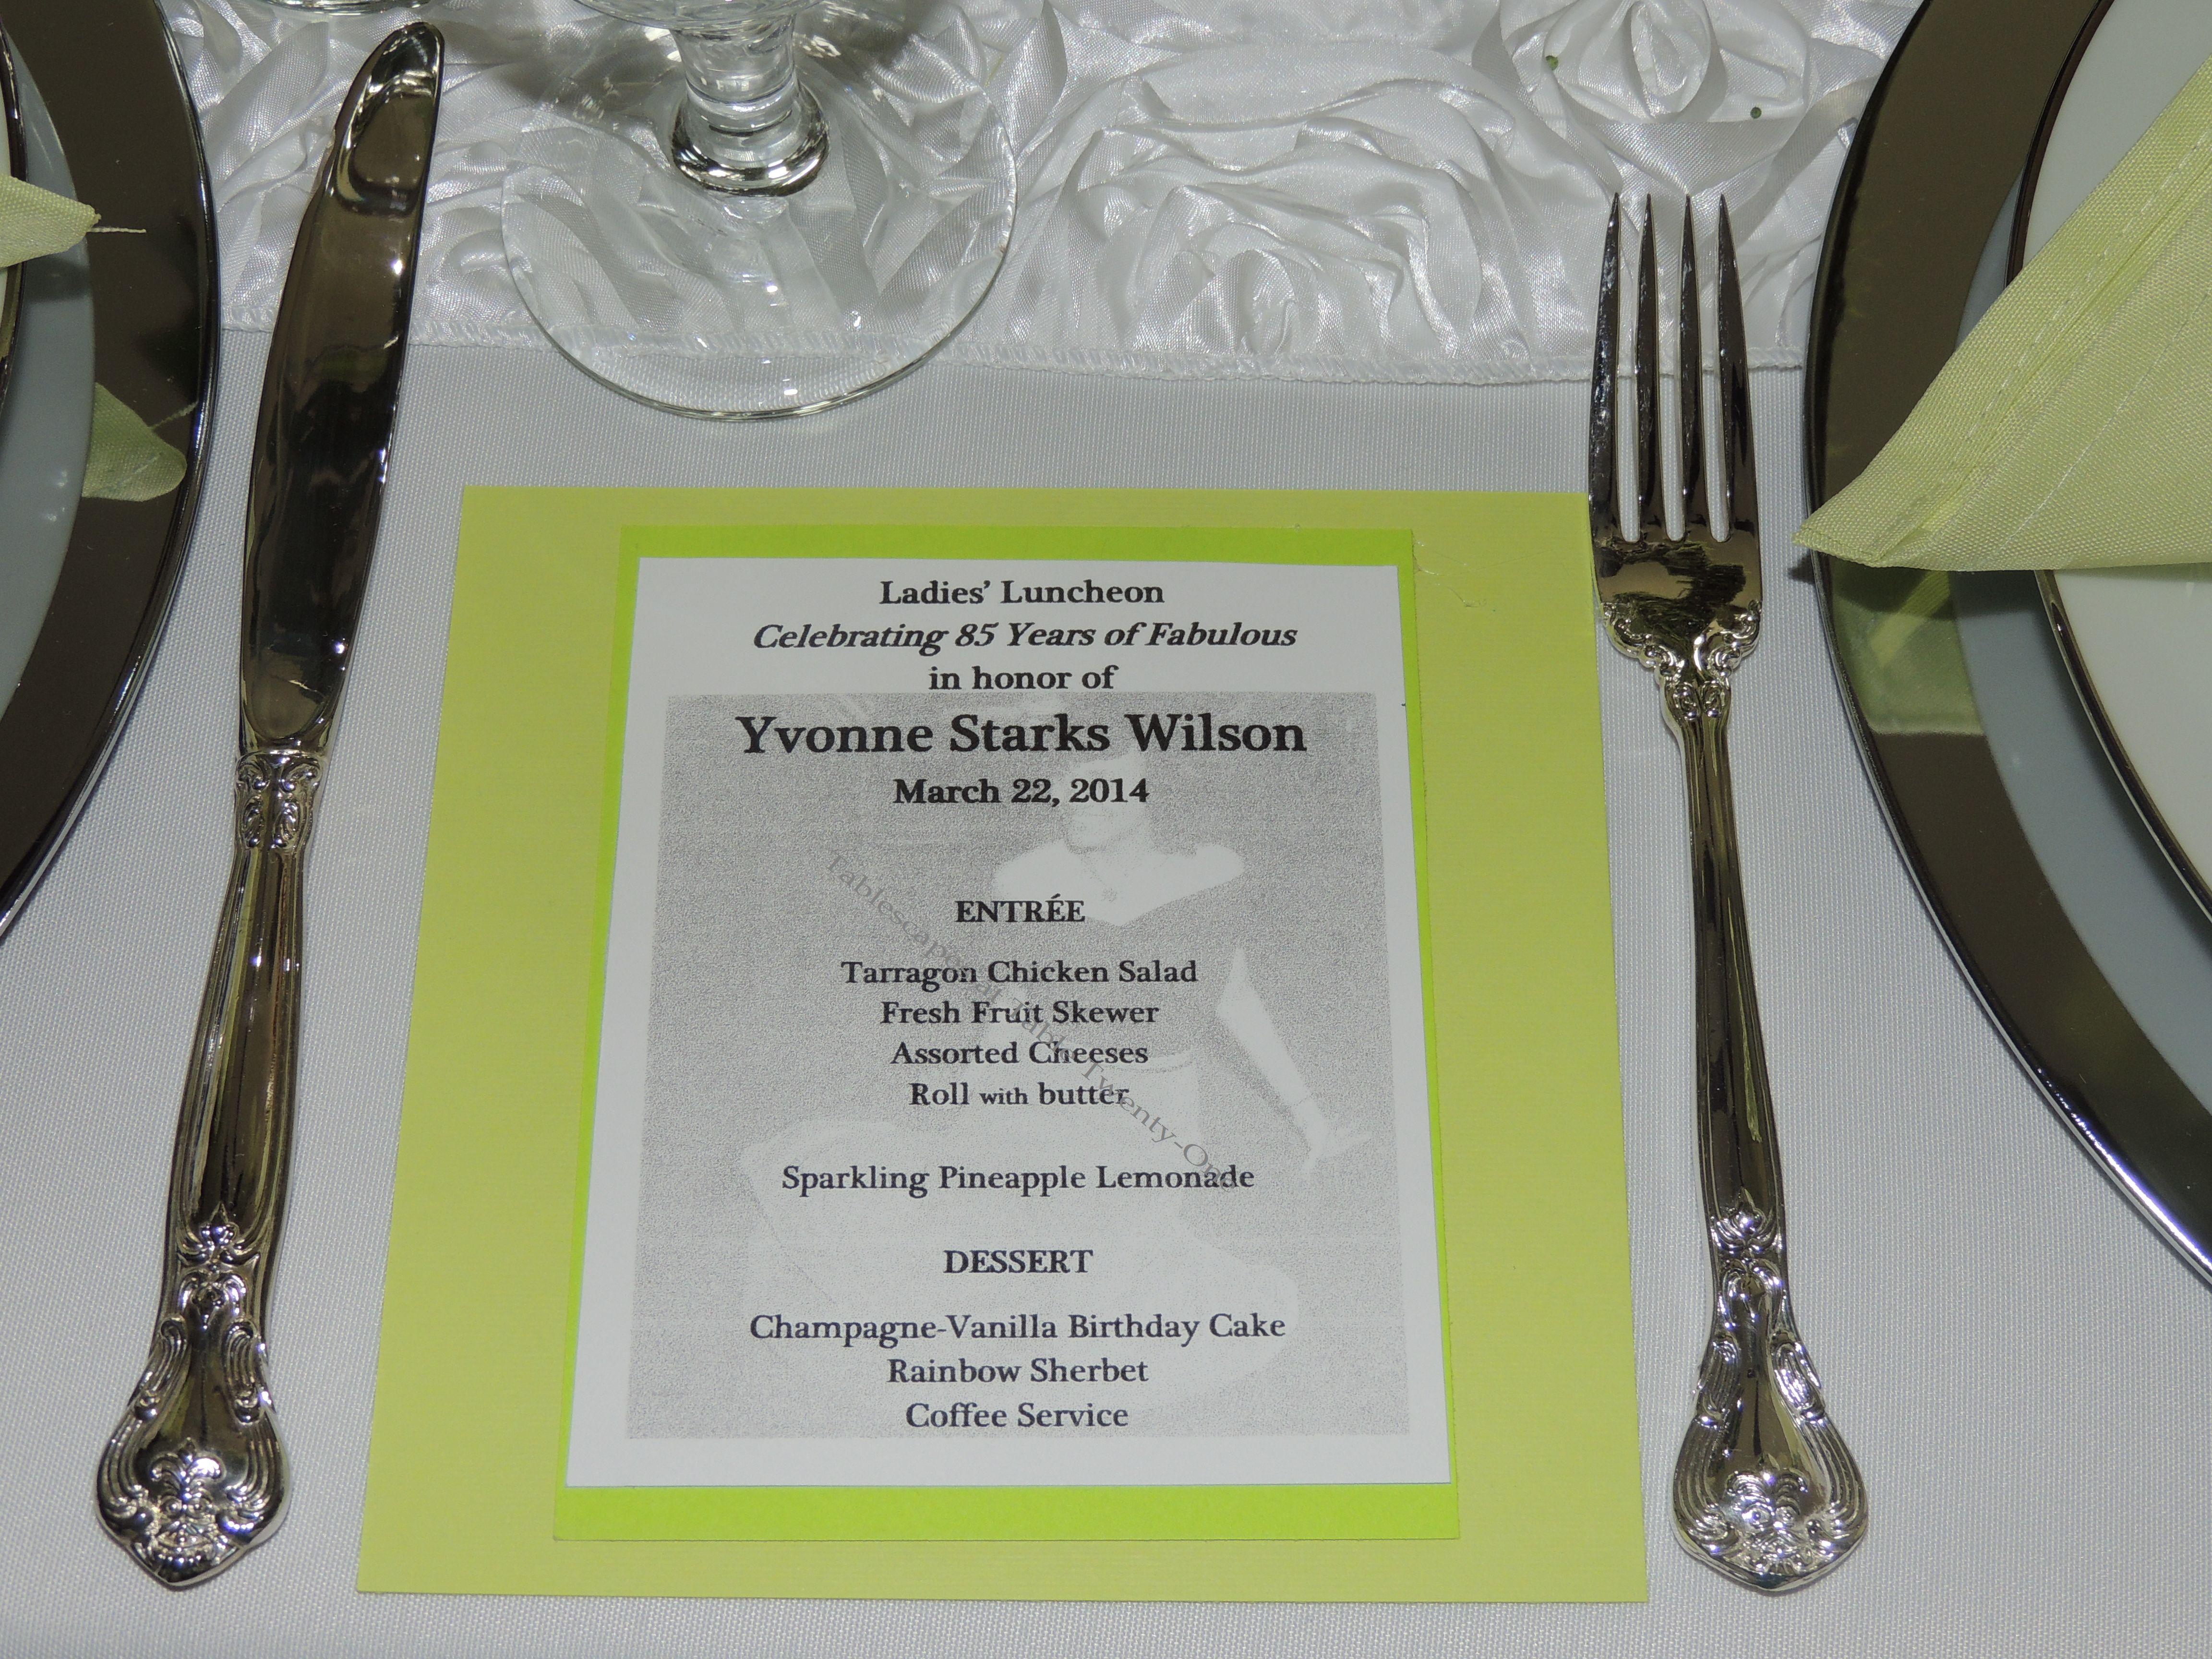 Tablescapes at Table Twenty-One, www.tabletwentyone.wordpress.com: Celebrating 85 Years of Fabulous - Menu